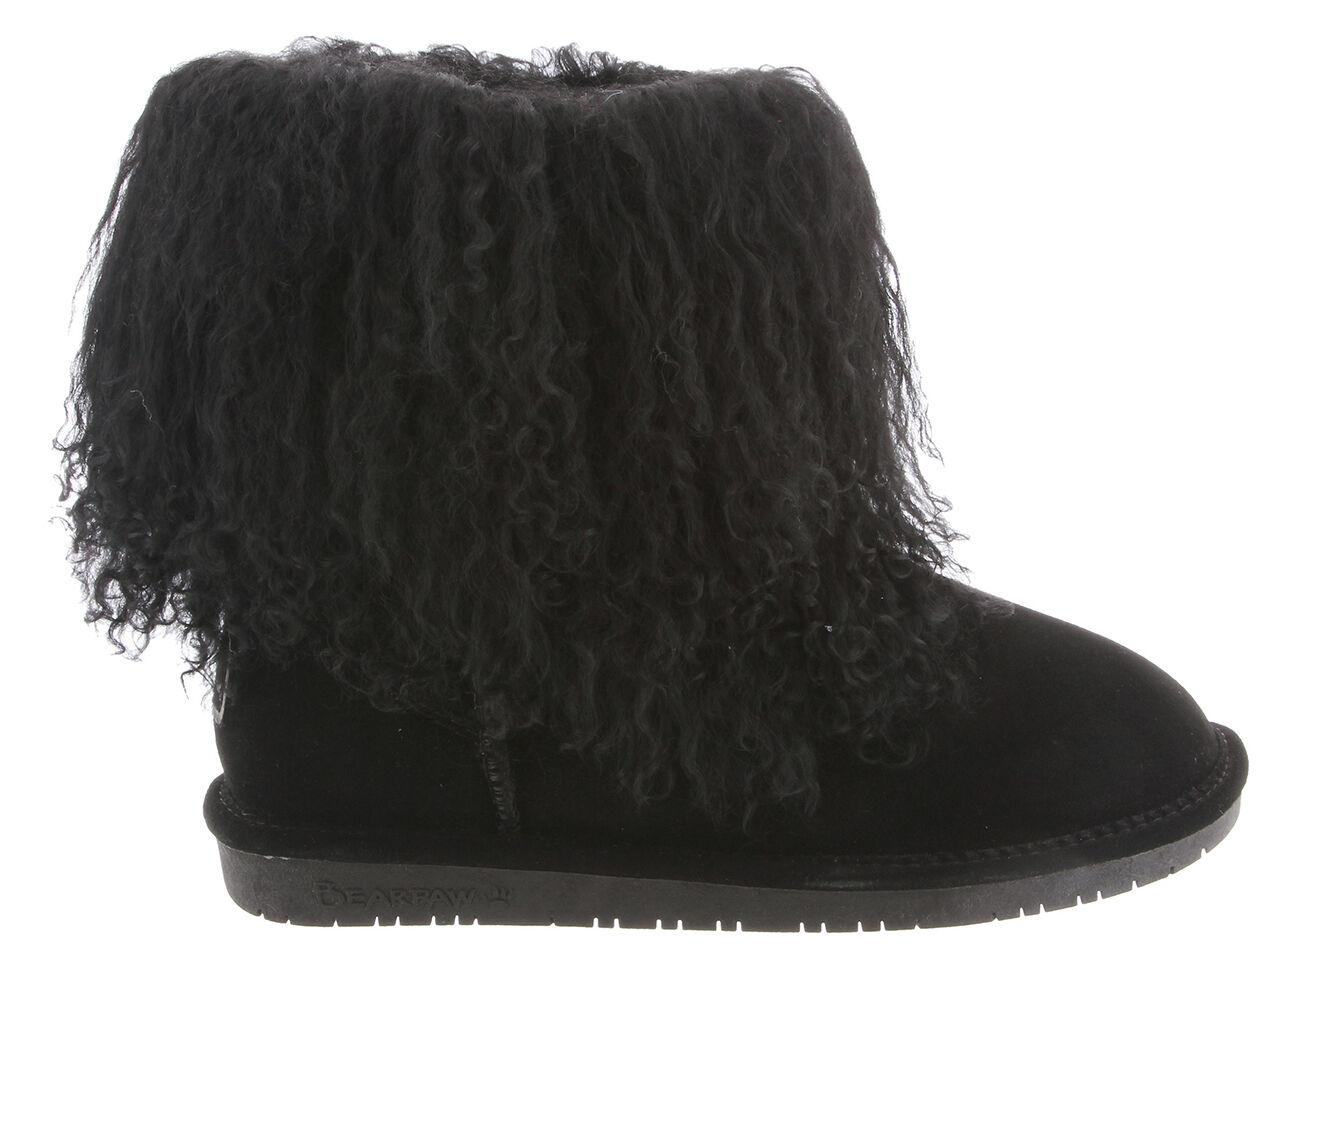 Women's Bearpaw Boo Boots Black